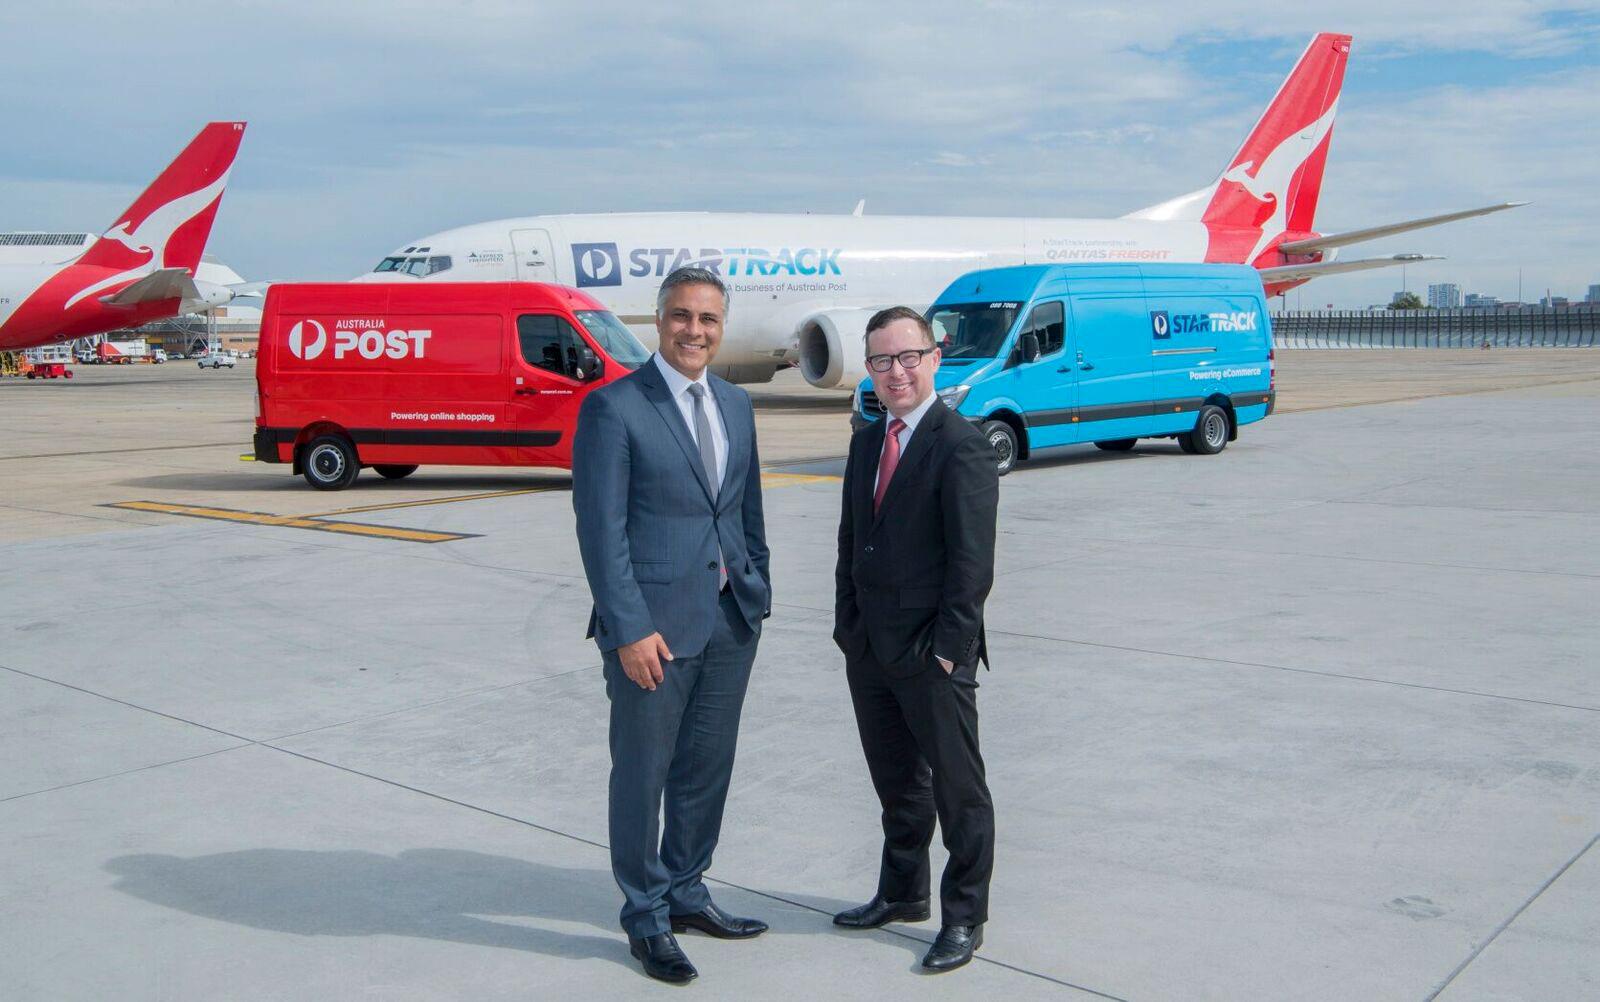 Qantas Freight And Australia Post Announce Dedicated Freighter Fleet